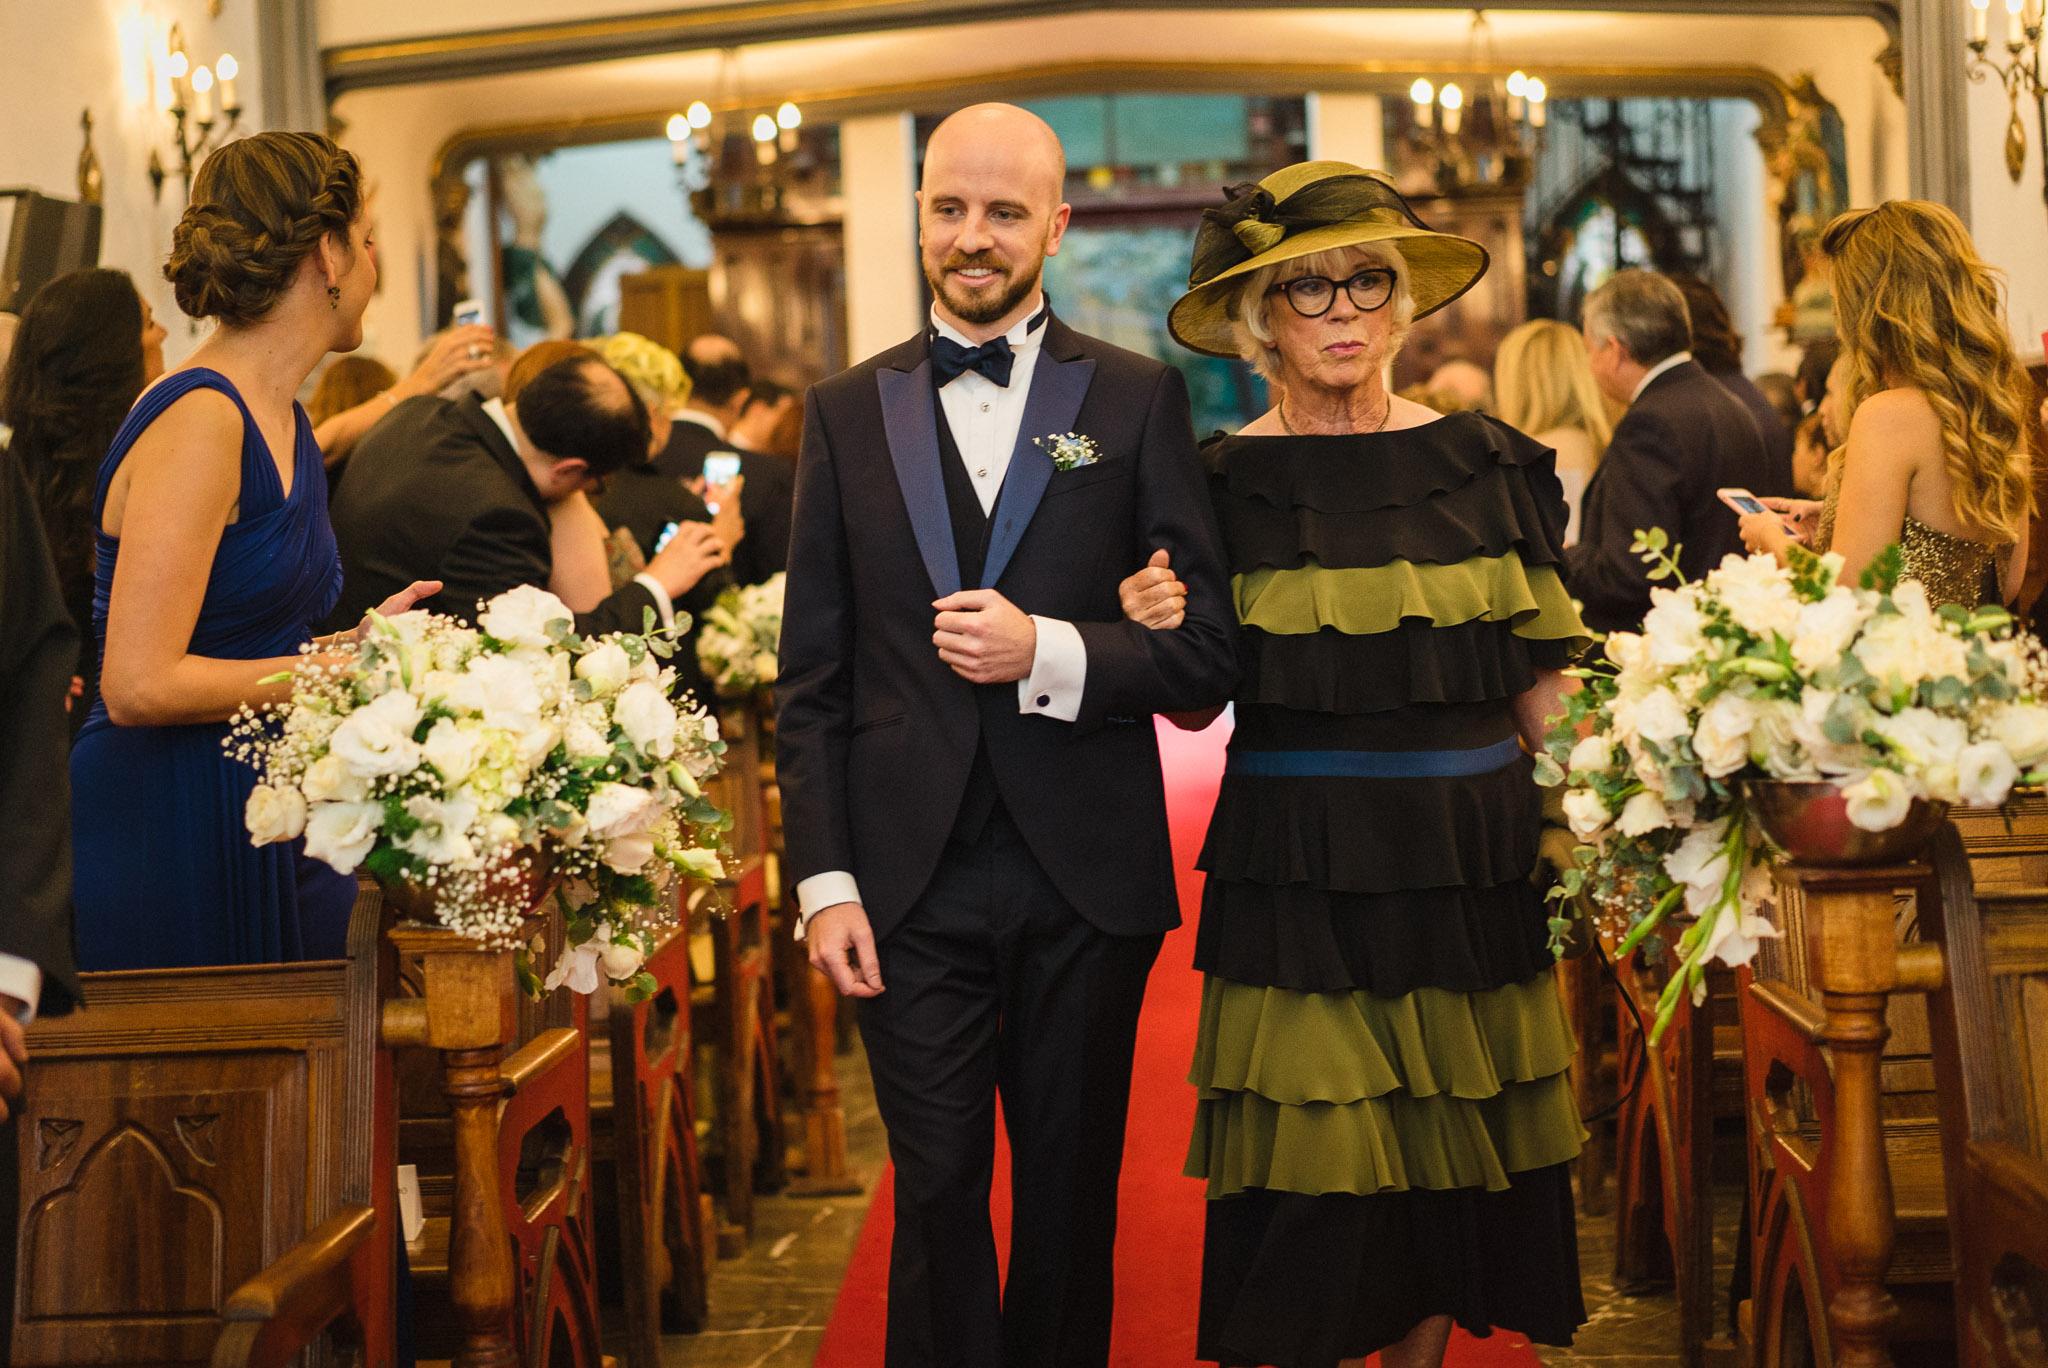 ©www.mauriziosolisbroca.com-20161001maurizio-solis-broca-mexico-canada-wedding-photographer20161001DSC07162-2-Edit.jpg